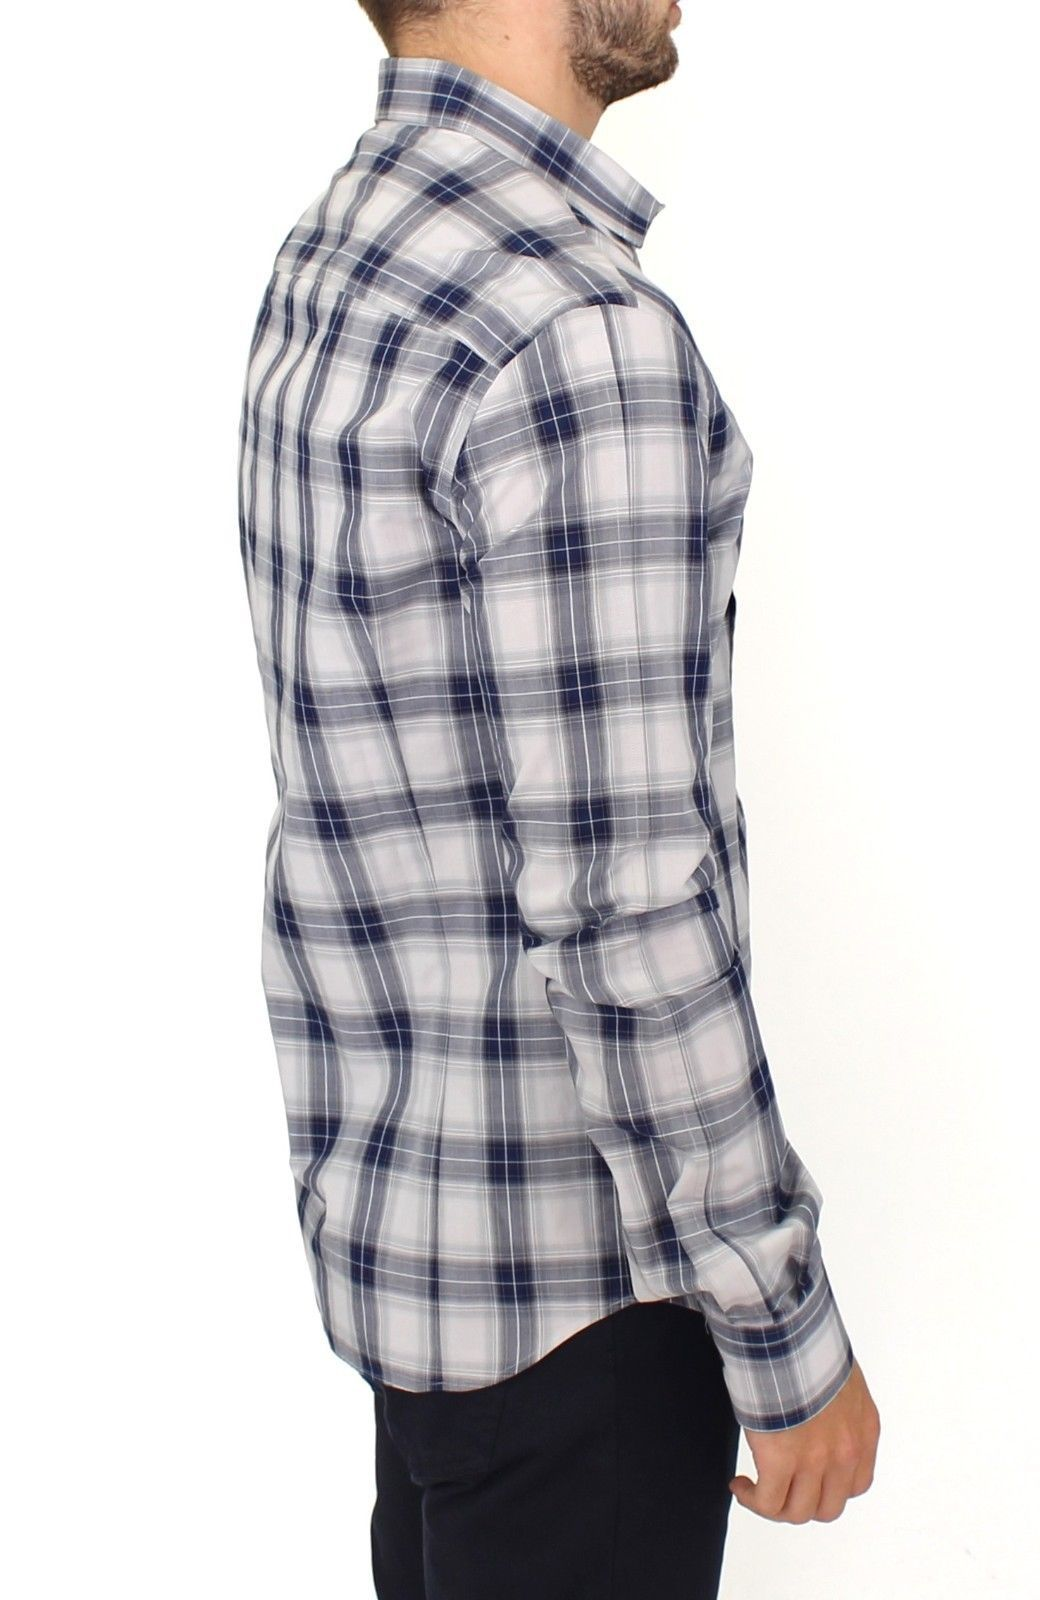 Ermanno Scervino Blue Checkered Cotton Casual Shirt Top